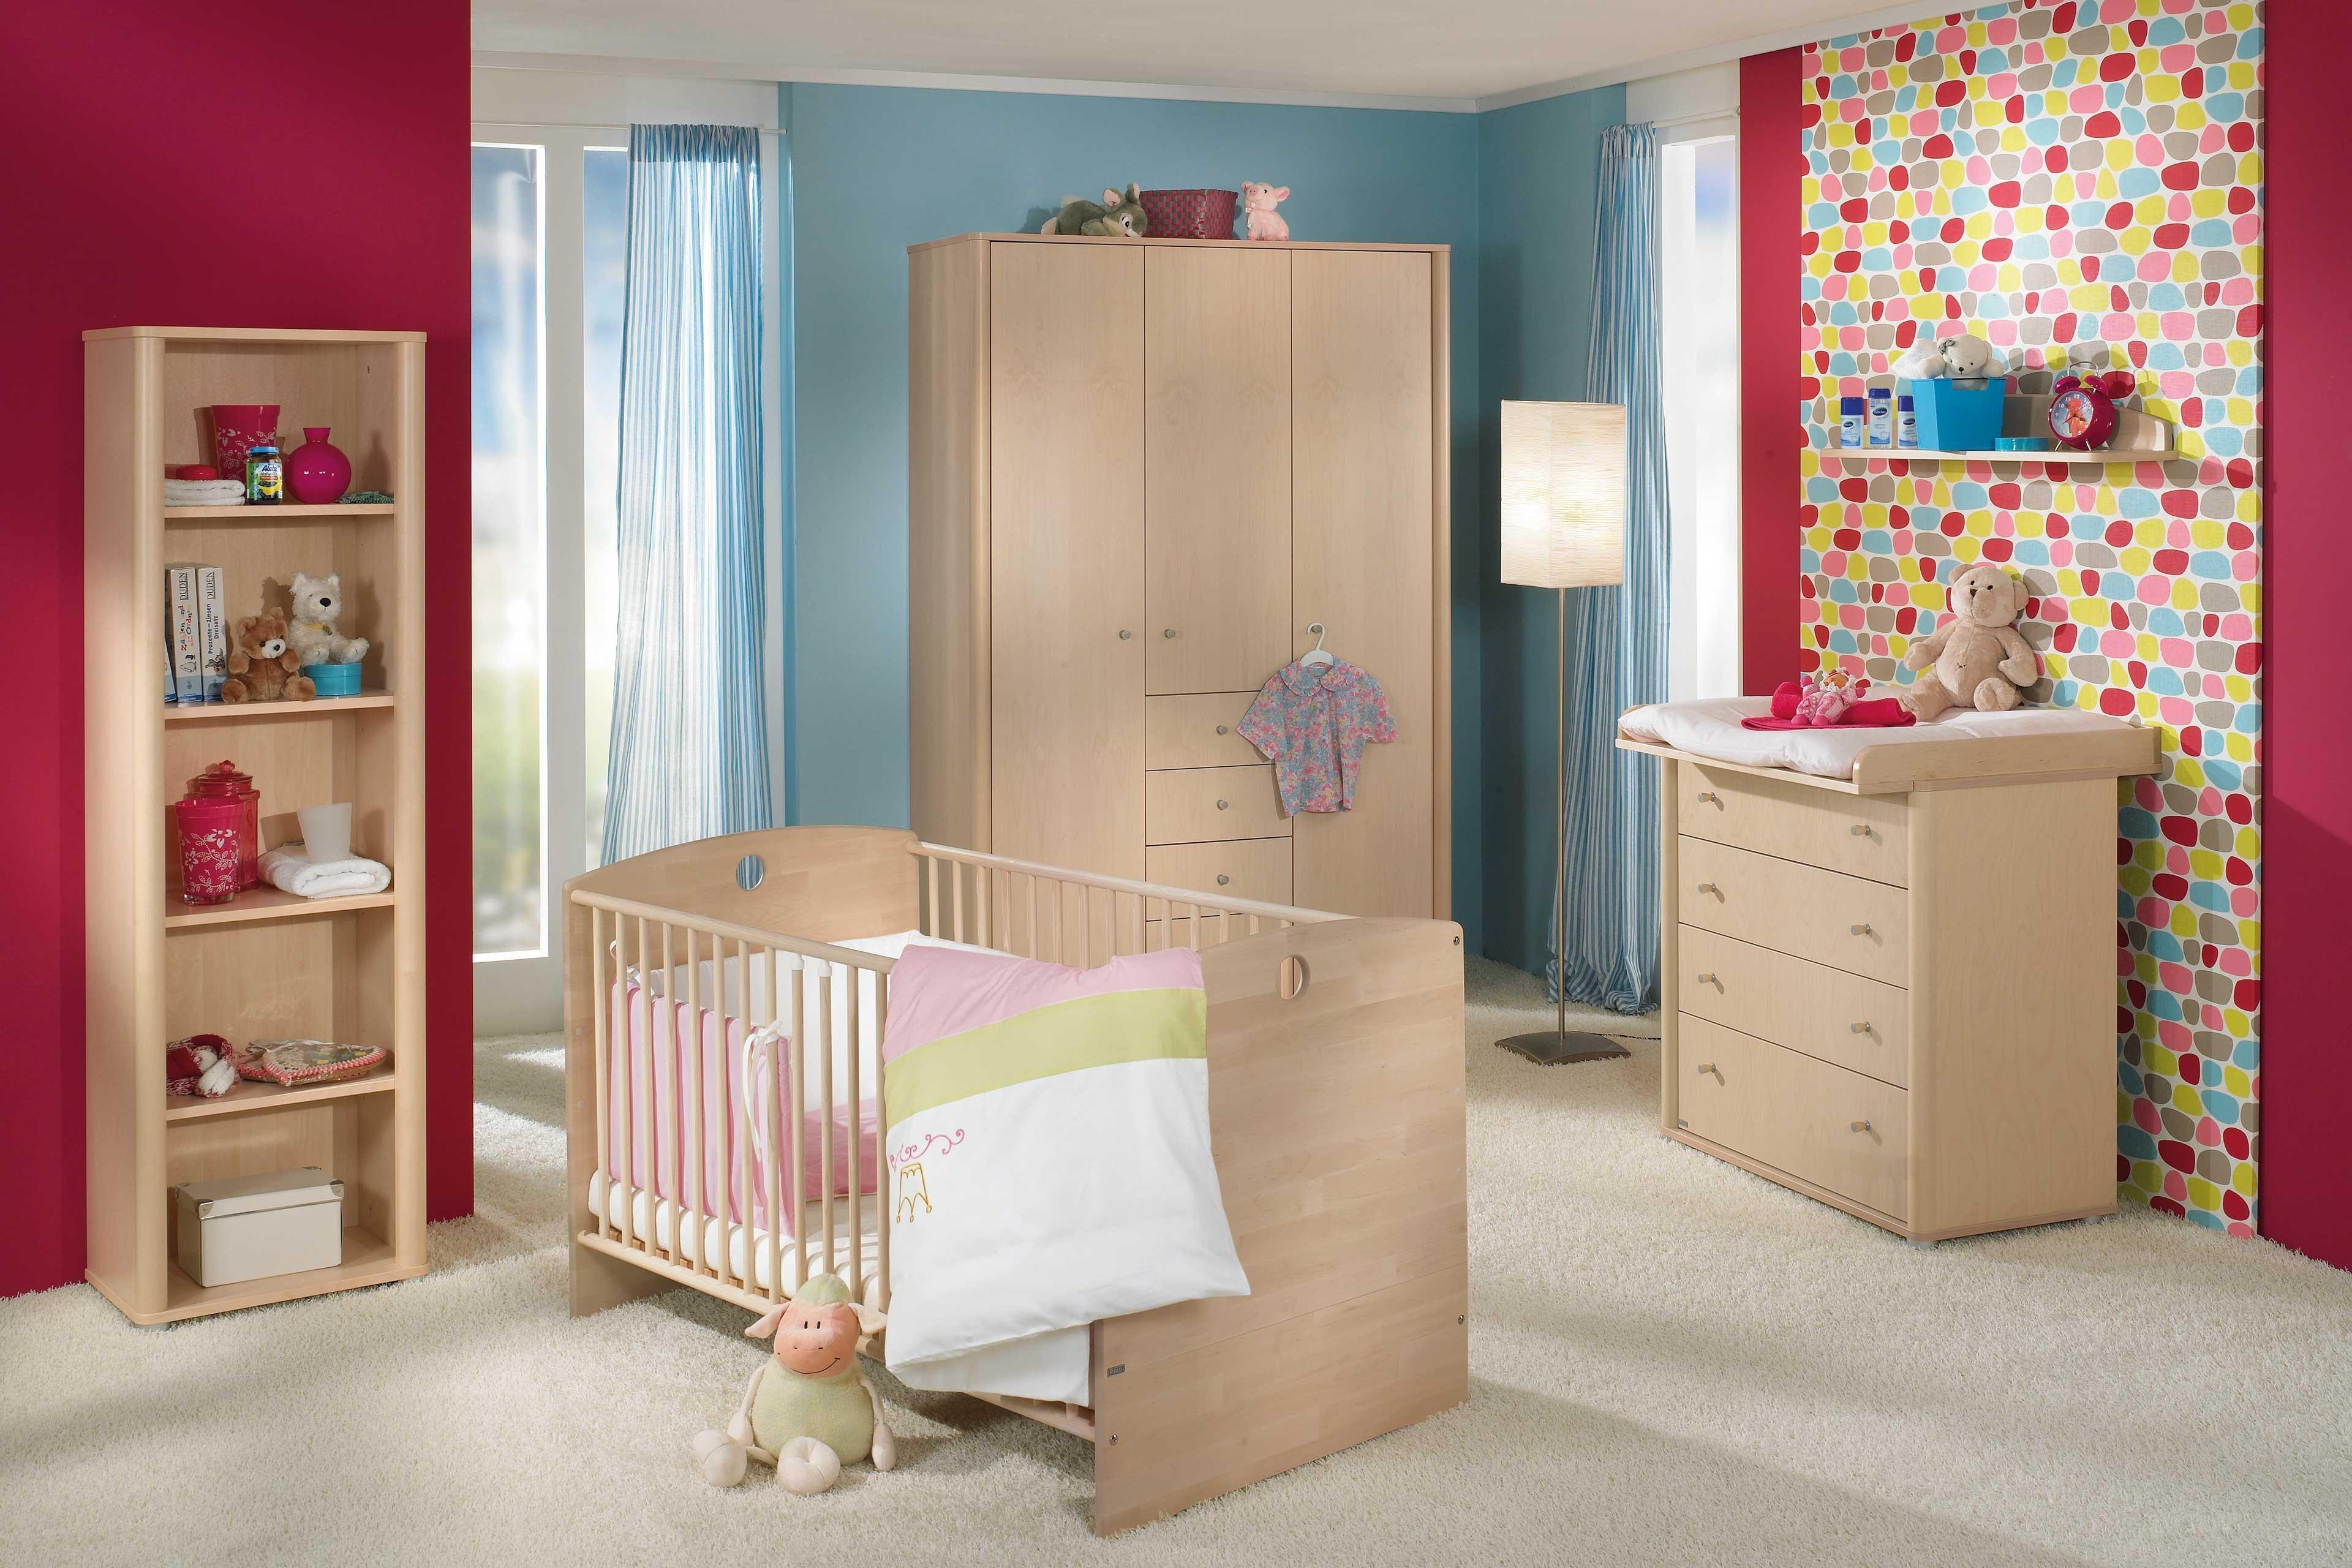 paidi babyzimmer fleximo birke hell m bel letz ihr online shop. Black Bedroom Furniture Sets. Home Design Ideas